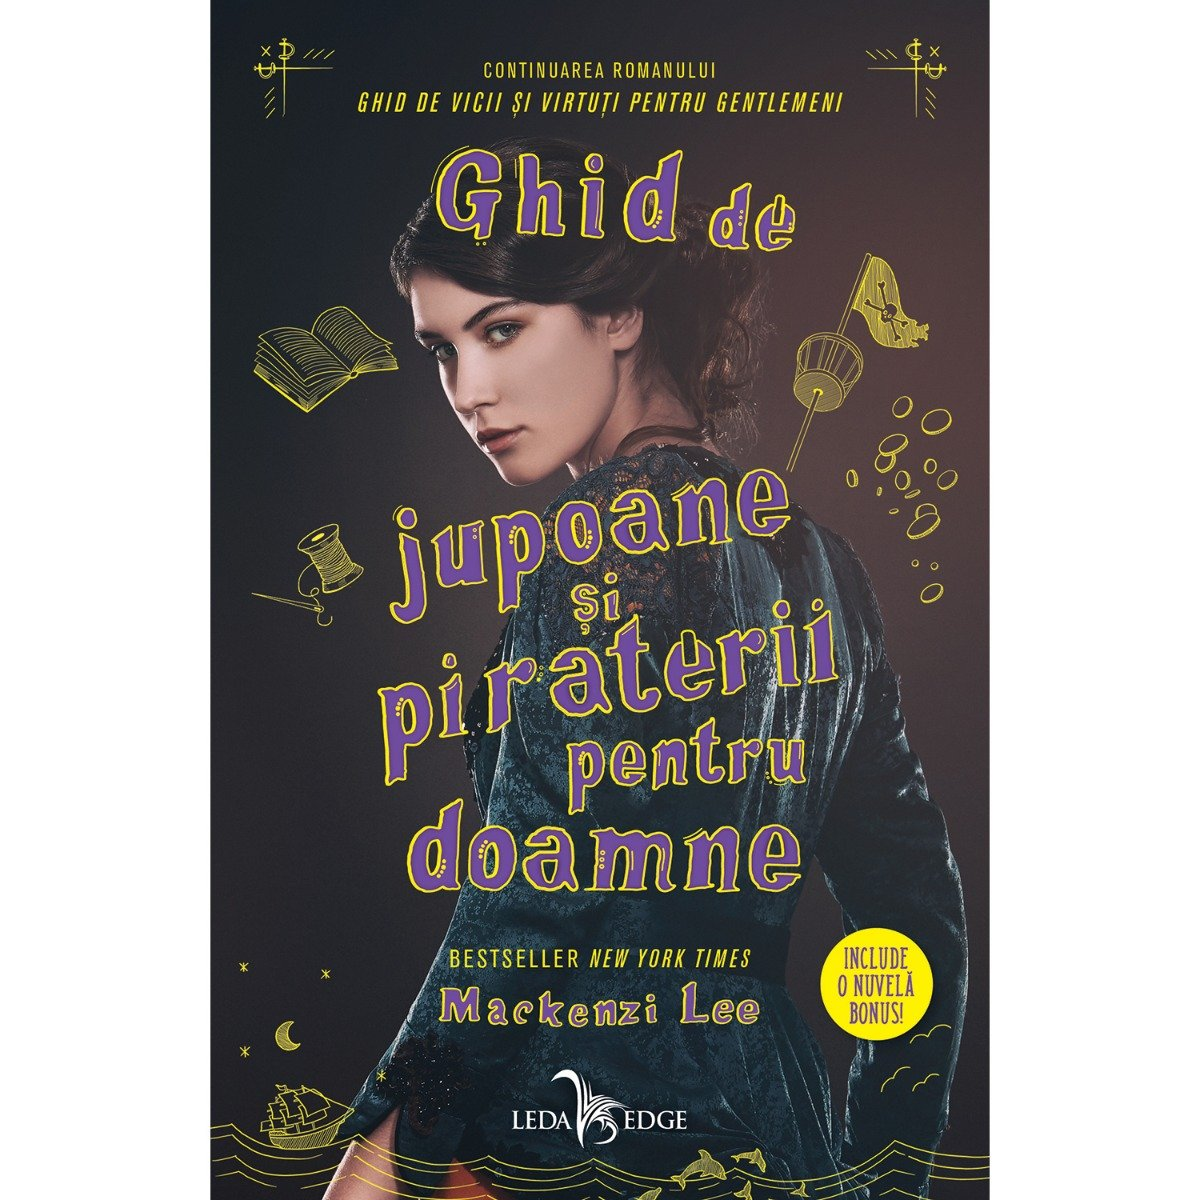 Carte Editura Corint, Ghid de jupoane si piraterii pentru doamne, Mackenzi Lee imagine